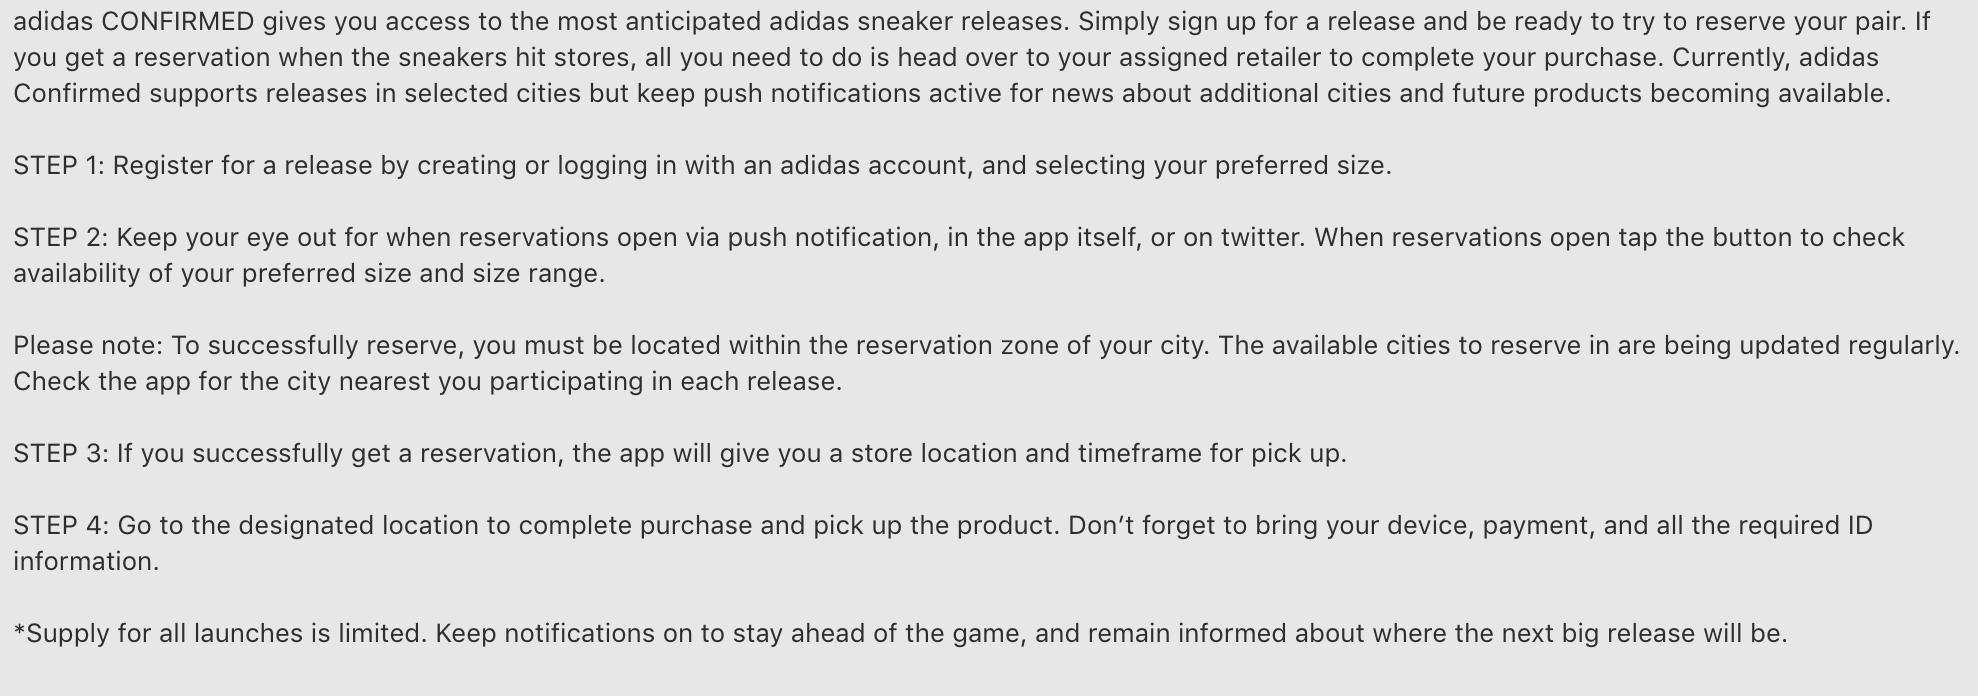 c86bd6596 Yeezy Adidas Online Download Adidas Confirmed app  ...